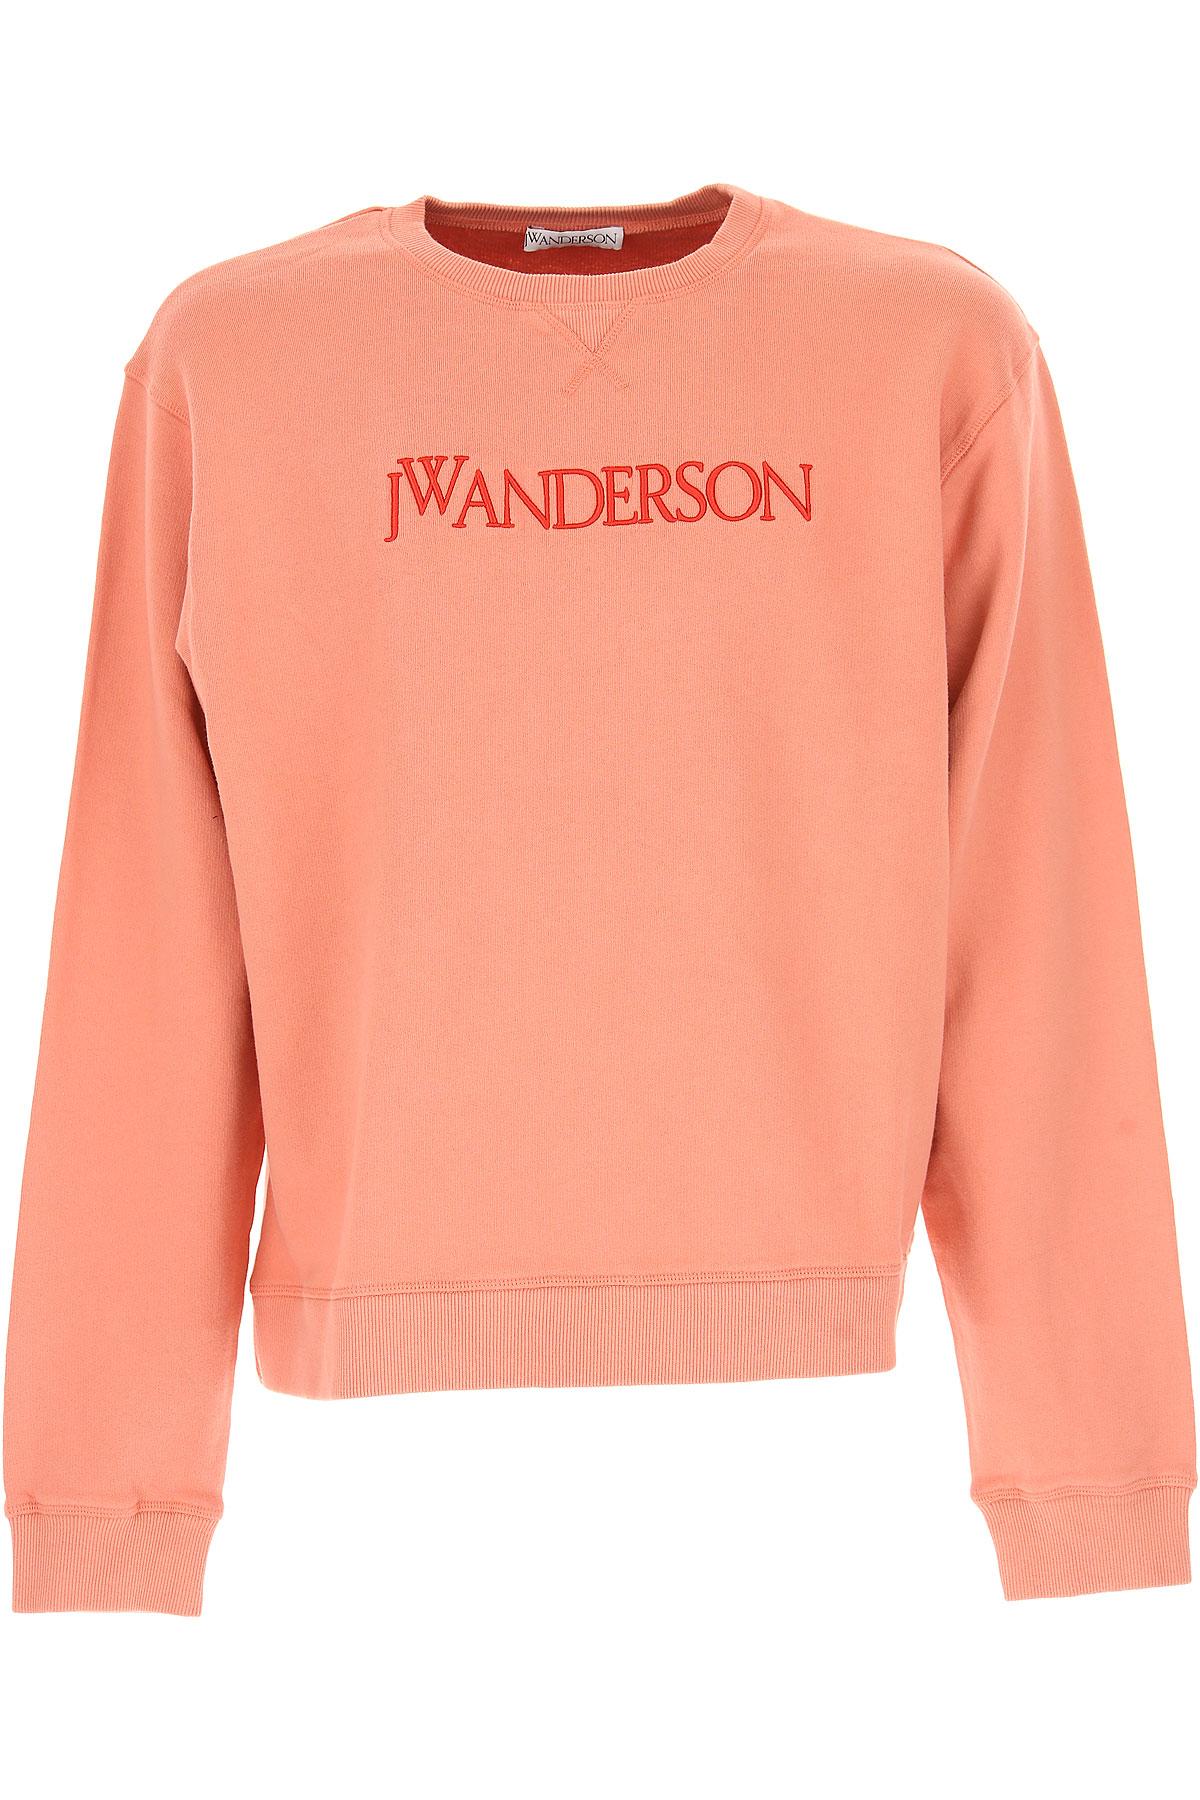 Image of J.W.Anderson Sweatshirt for Men, Watermelon, Cotton, 2017, 1 - Uk/Usa S - Ita 46 2 - Uk/Usa M - Ita 48 3 - Uk/Usa L - Ita 50 4 - Uk/Usa XL - Ita 52